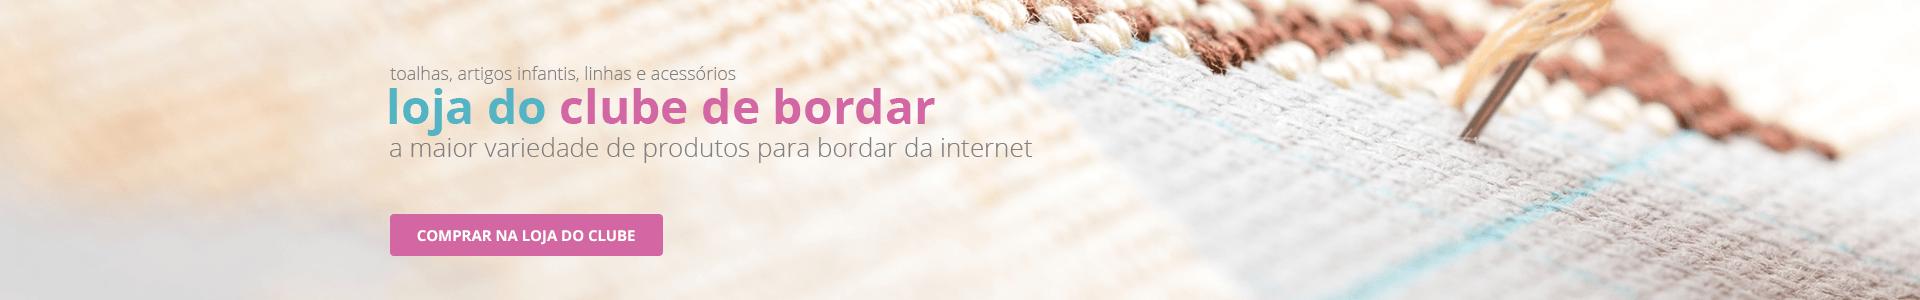 Loja do Clube de Bordar, a maior variedade de produtos para bordar da internet | Clube de Bordar | Compre Agora!